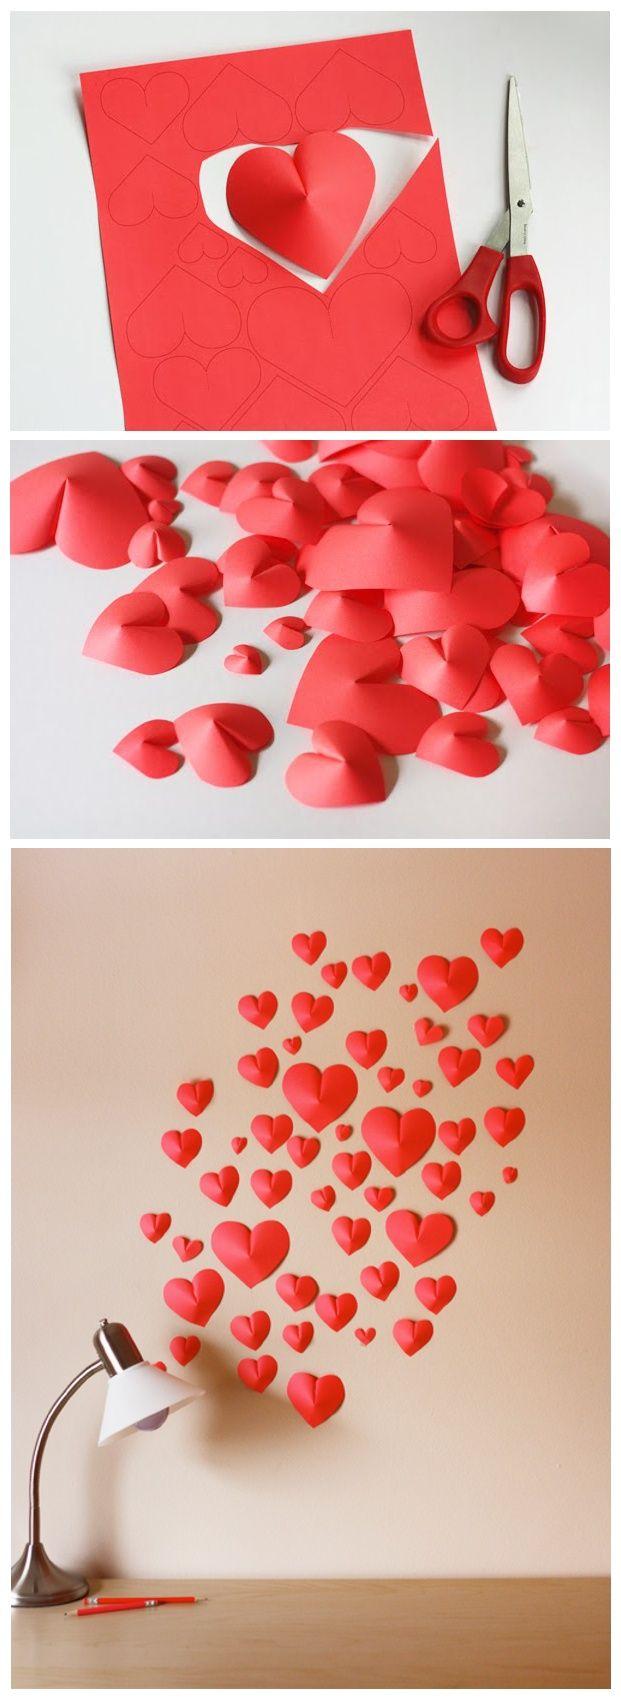 Cupid S Post Office Valentine S Day Party Kara S Party Ideas Valentines Day Party Valentine Decorations Valentine S Day Diy